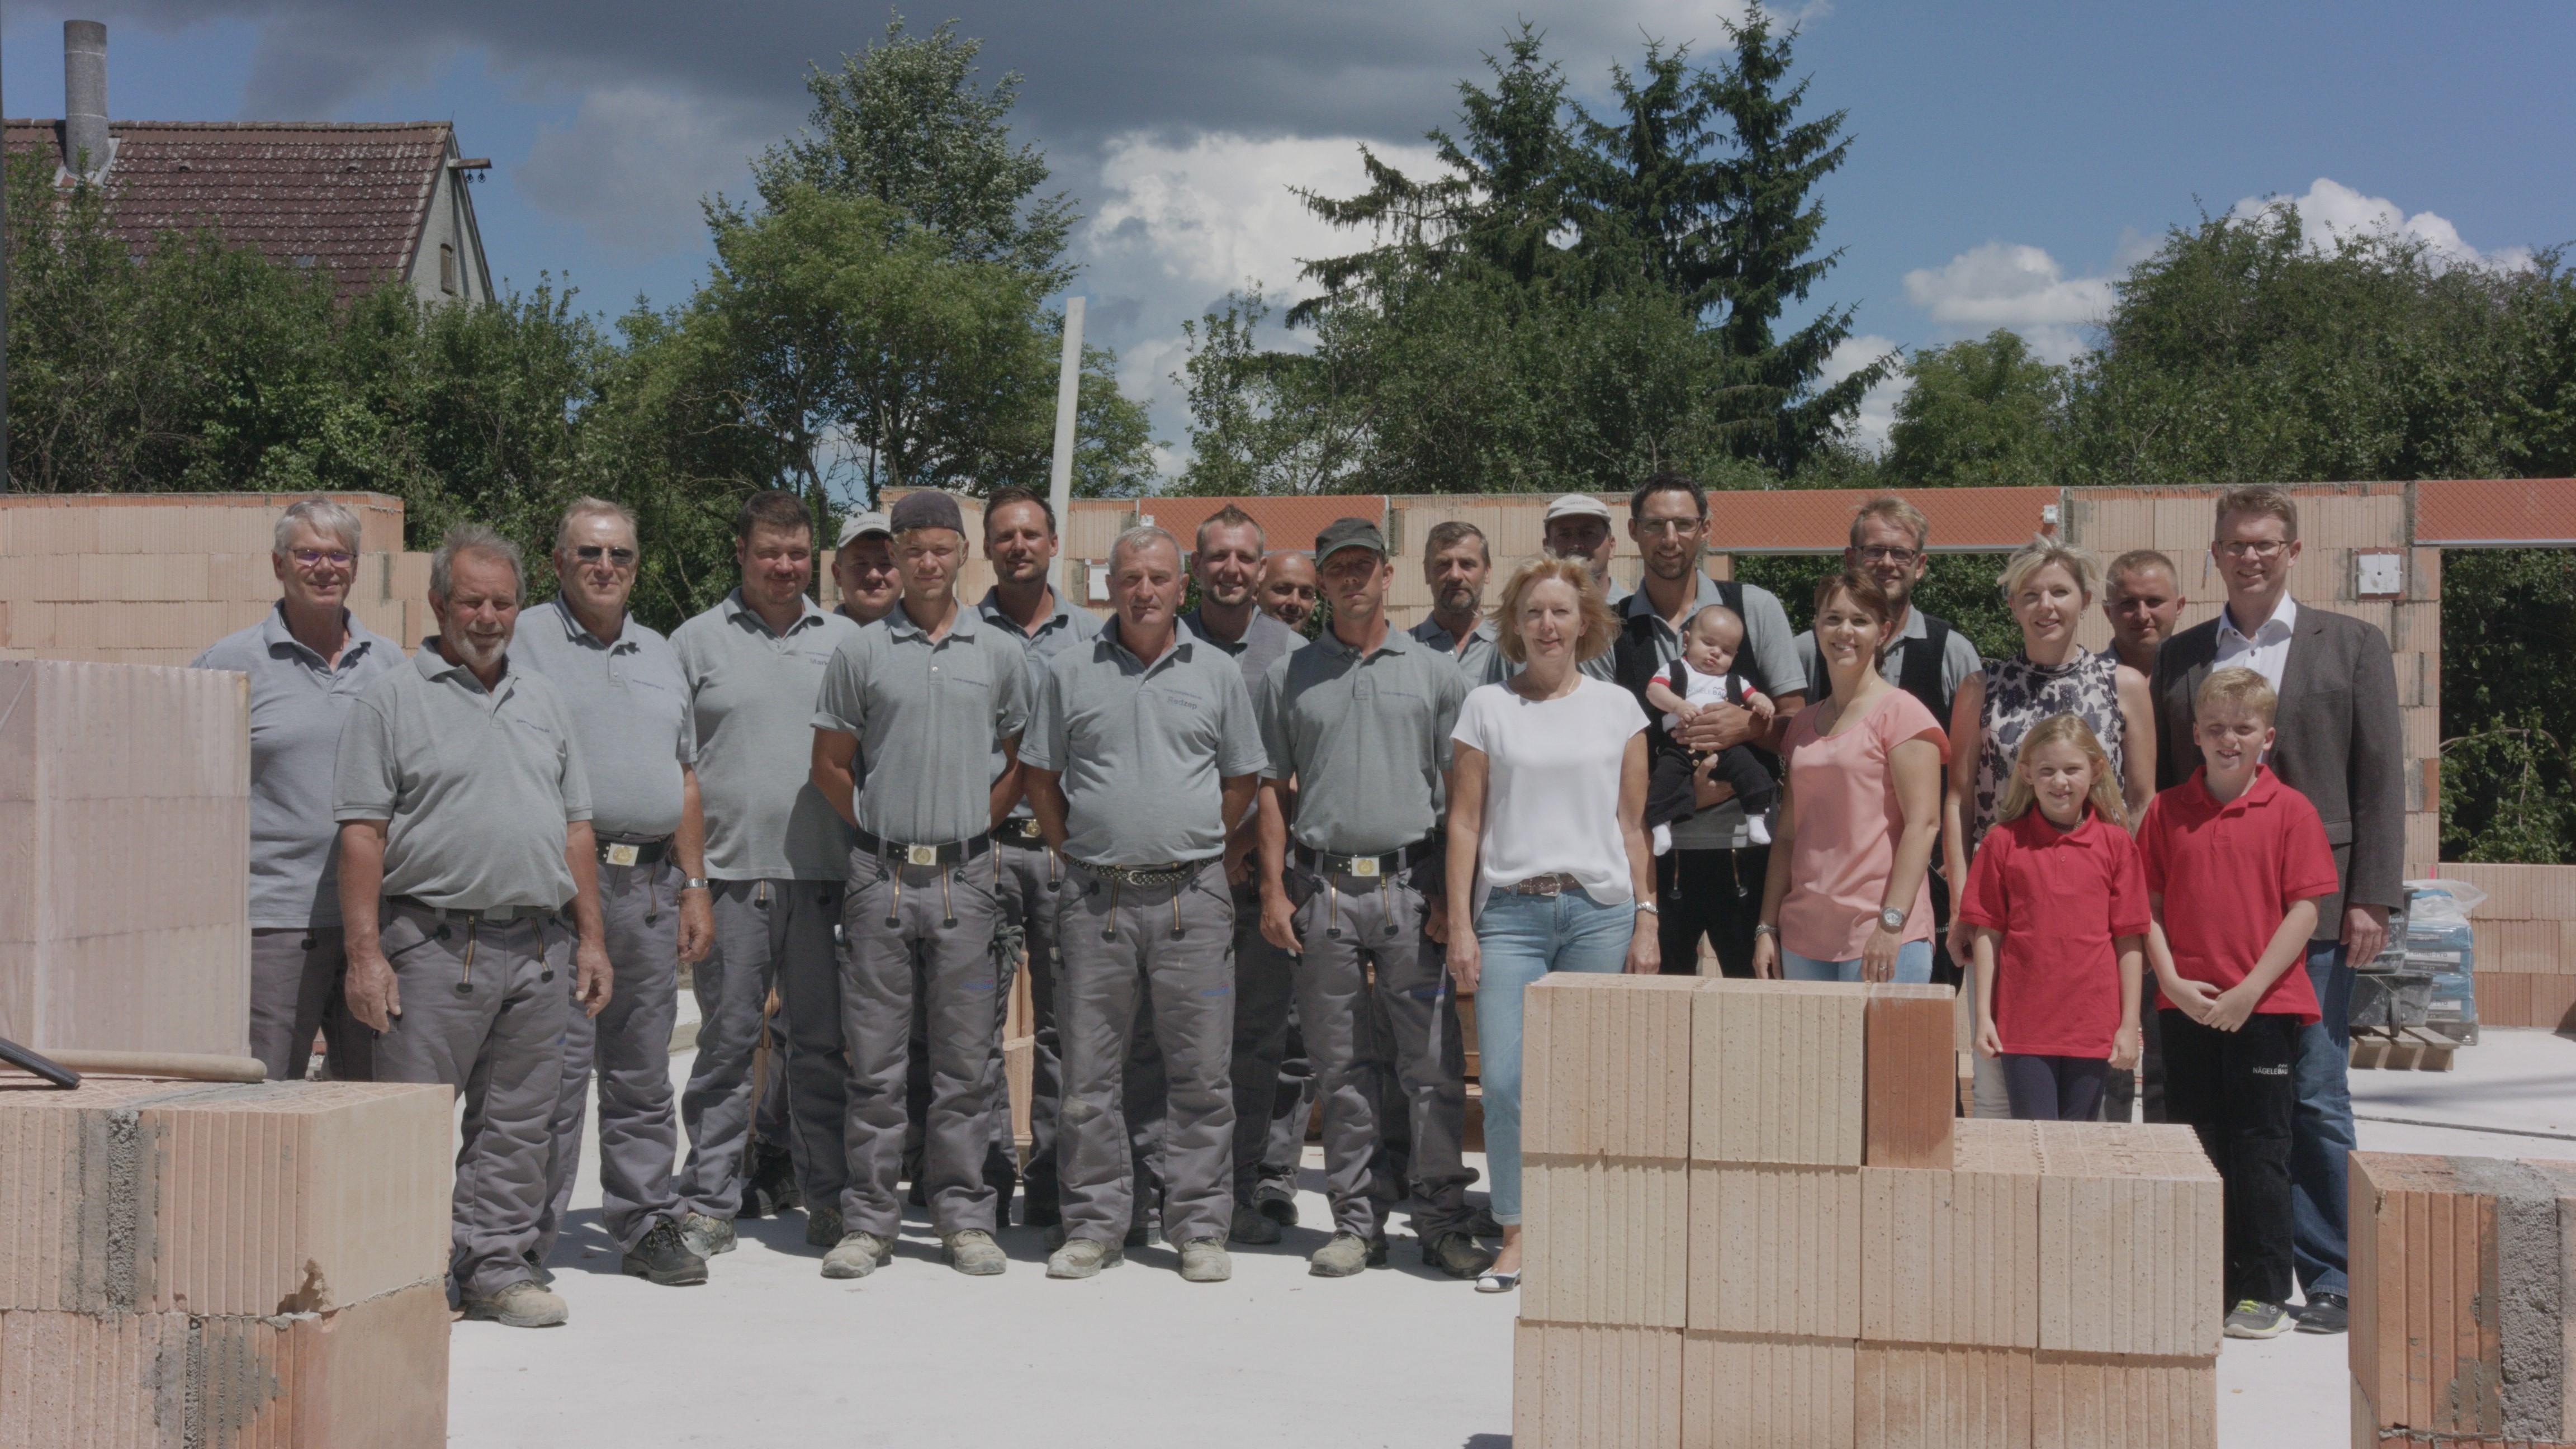 Bauunternehmen Ulm team nägele bau bauträger bauunternehmen planungsbüro neu ulm